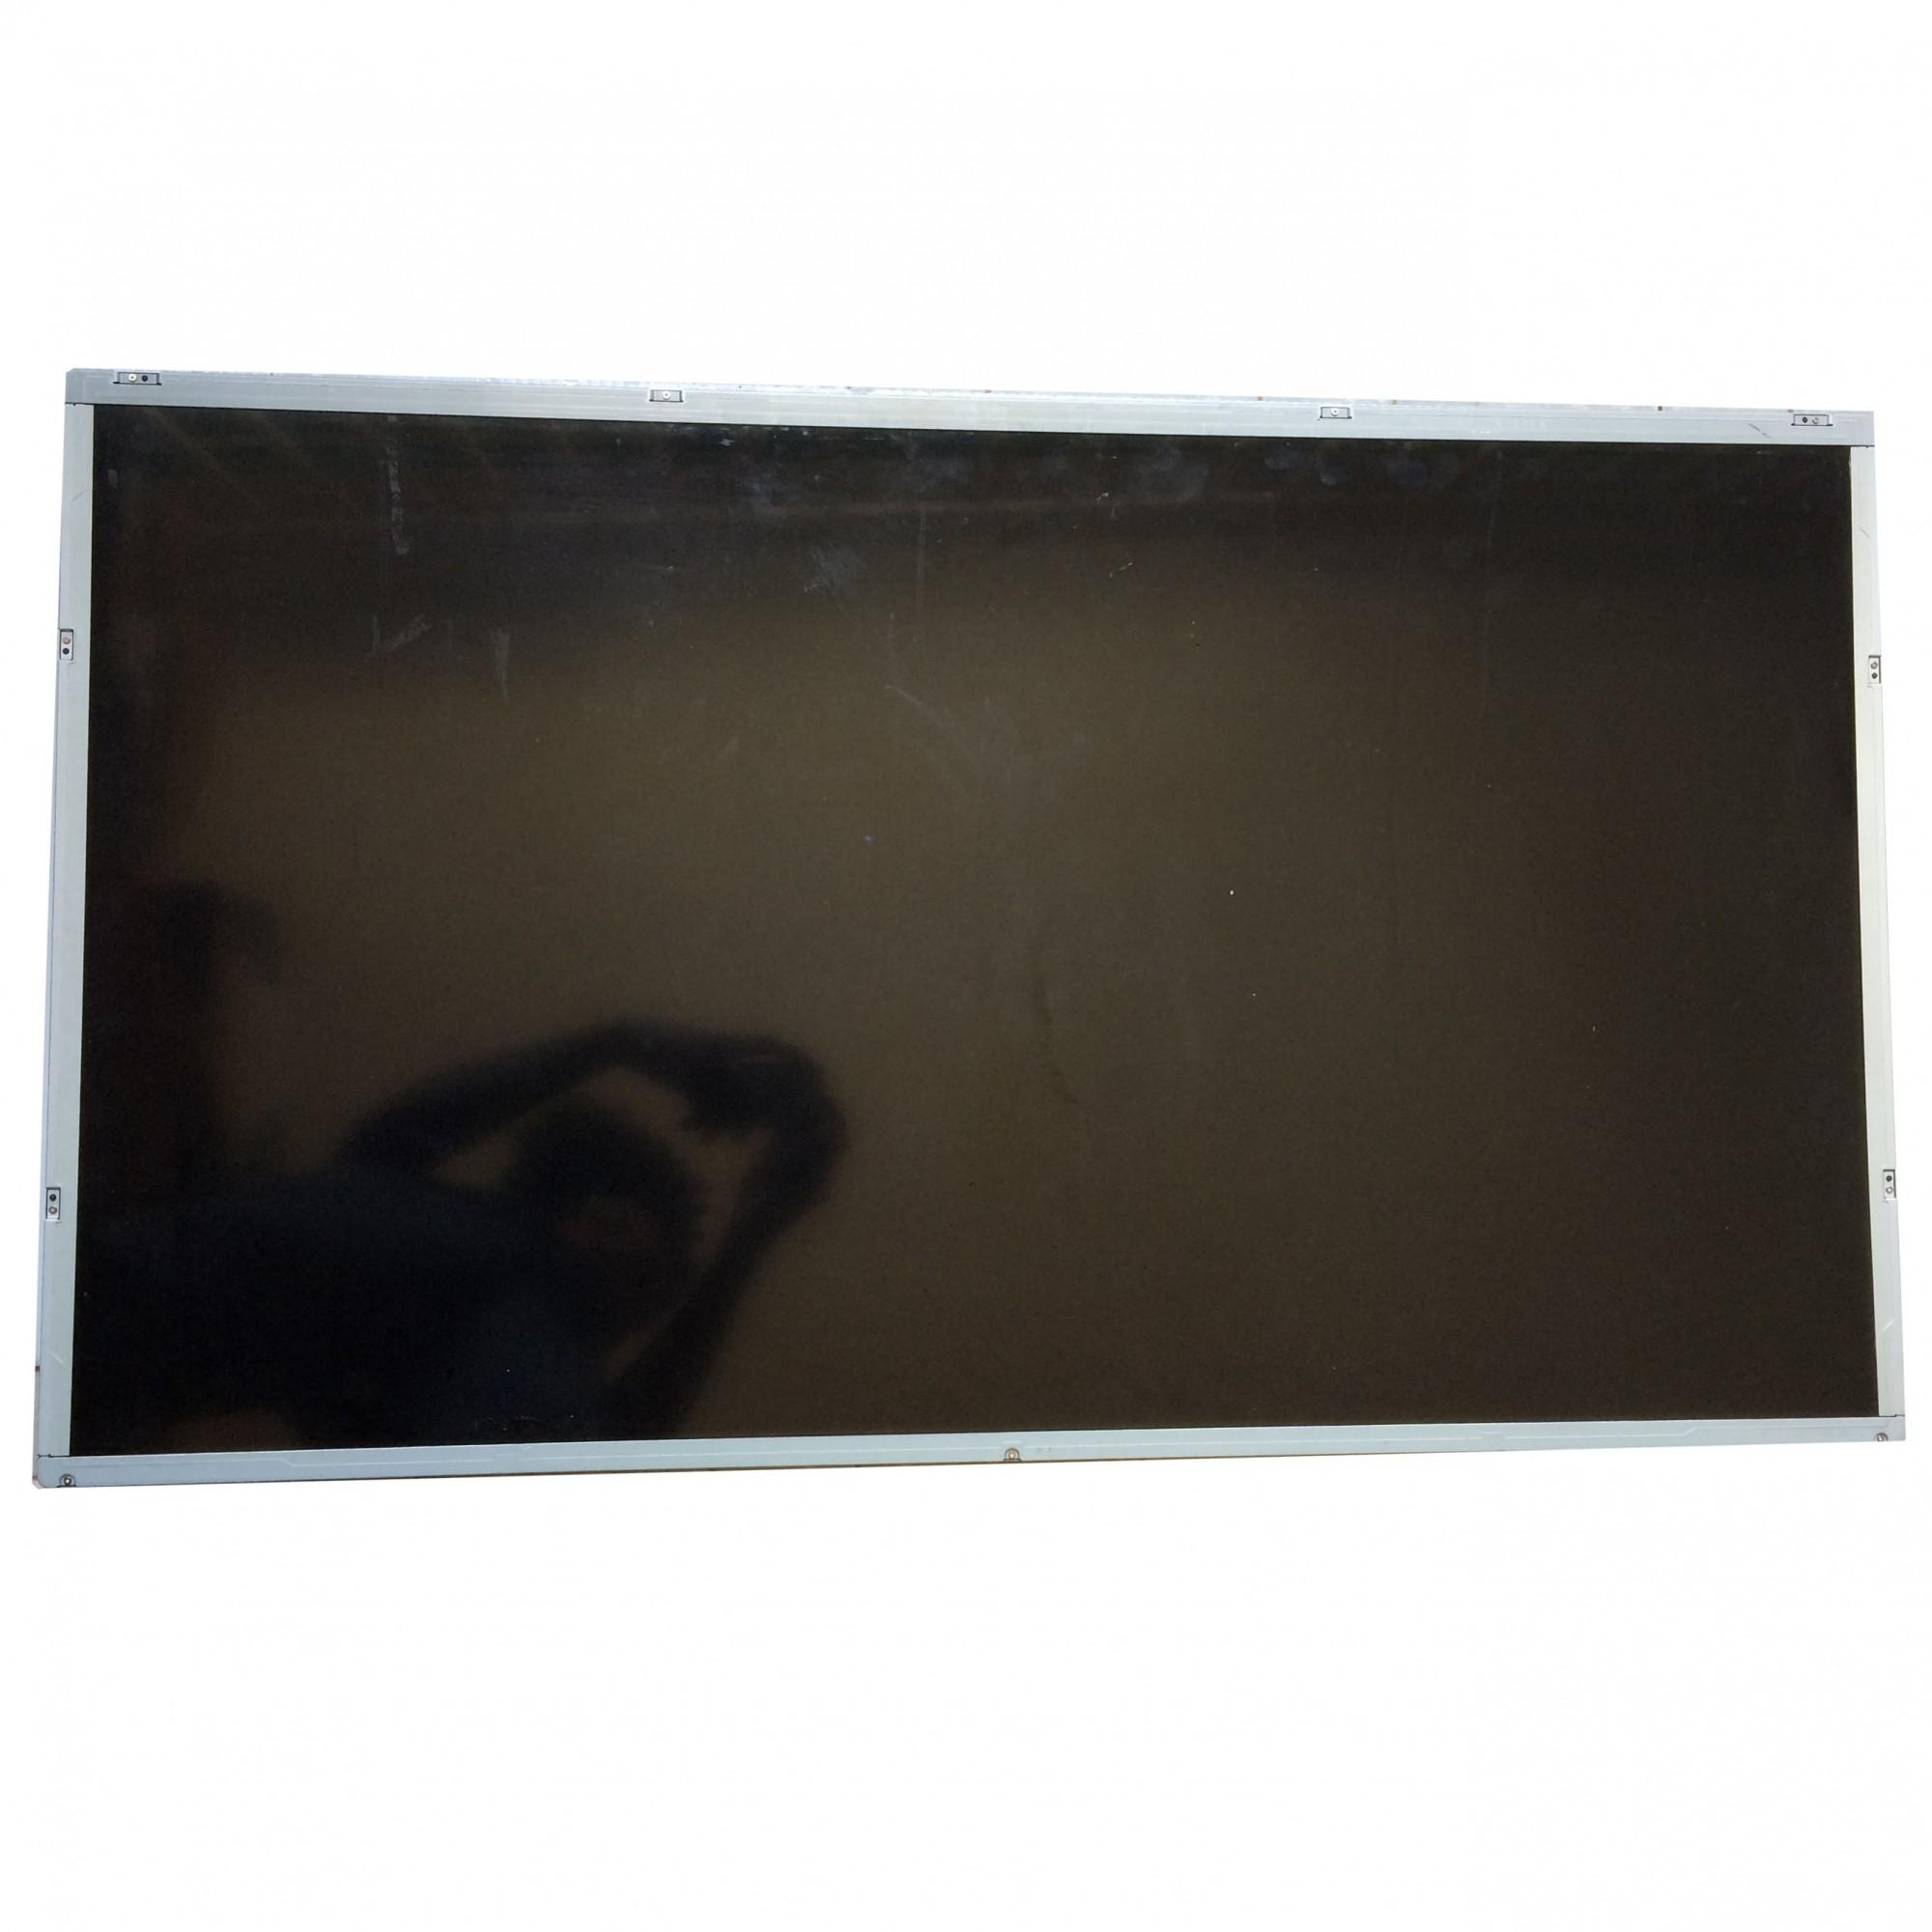 Tela Display TV 42'' PN:T420HW09.V2 - Retirado